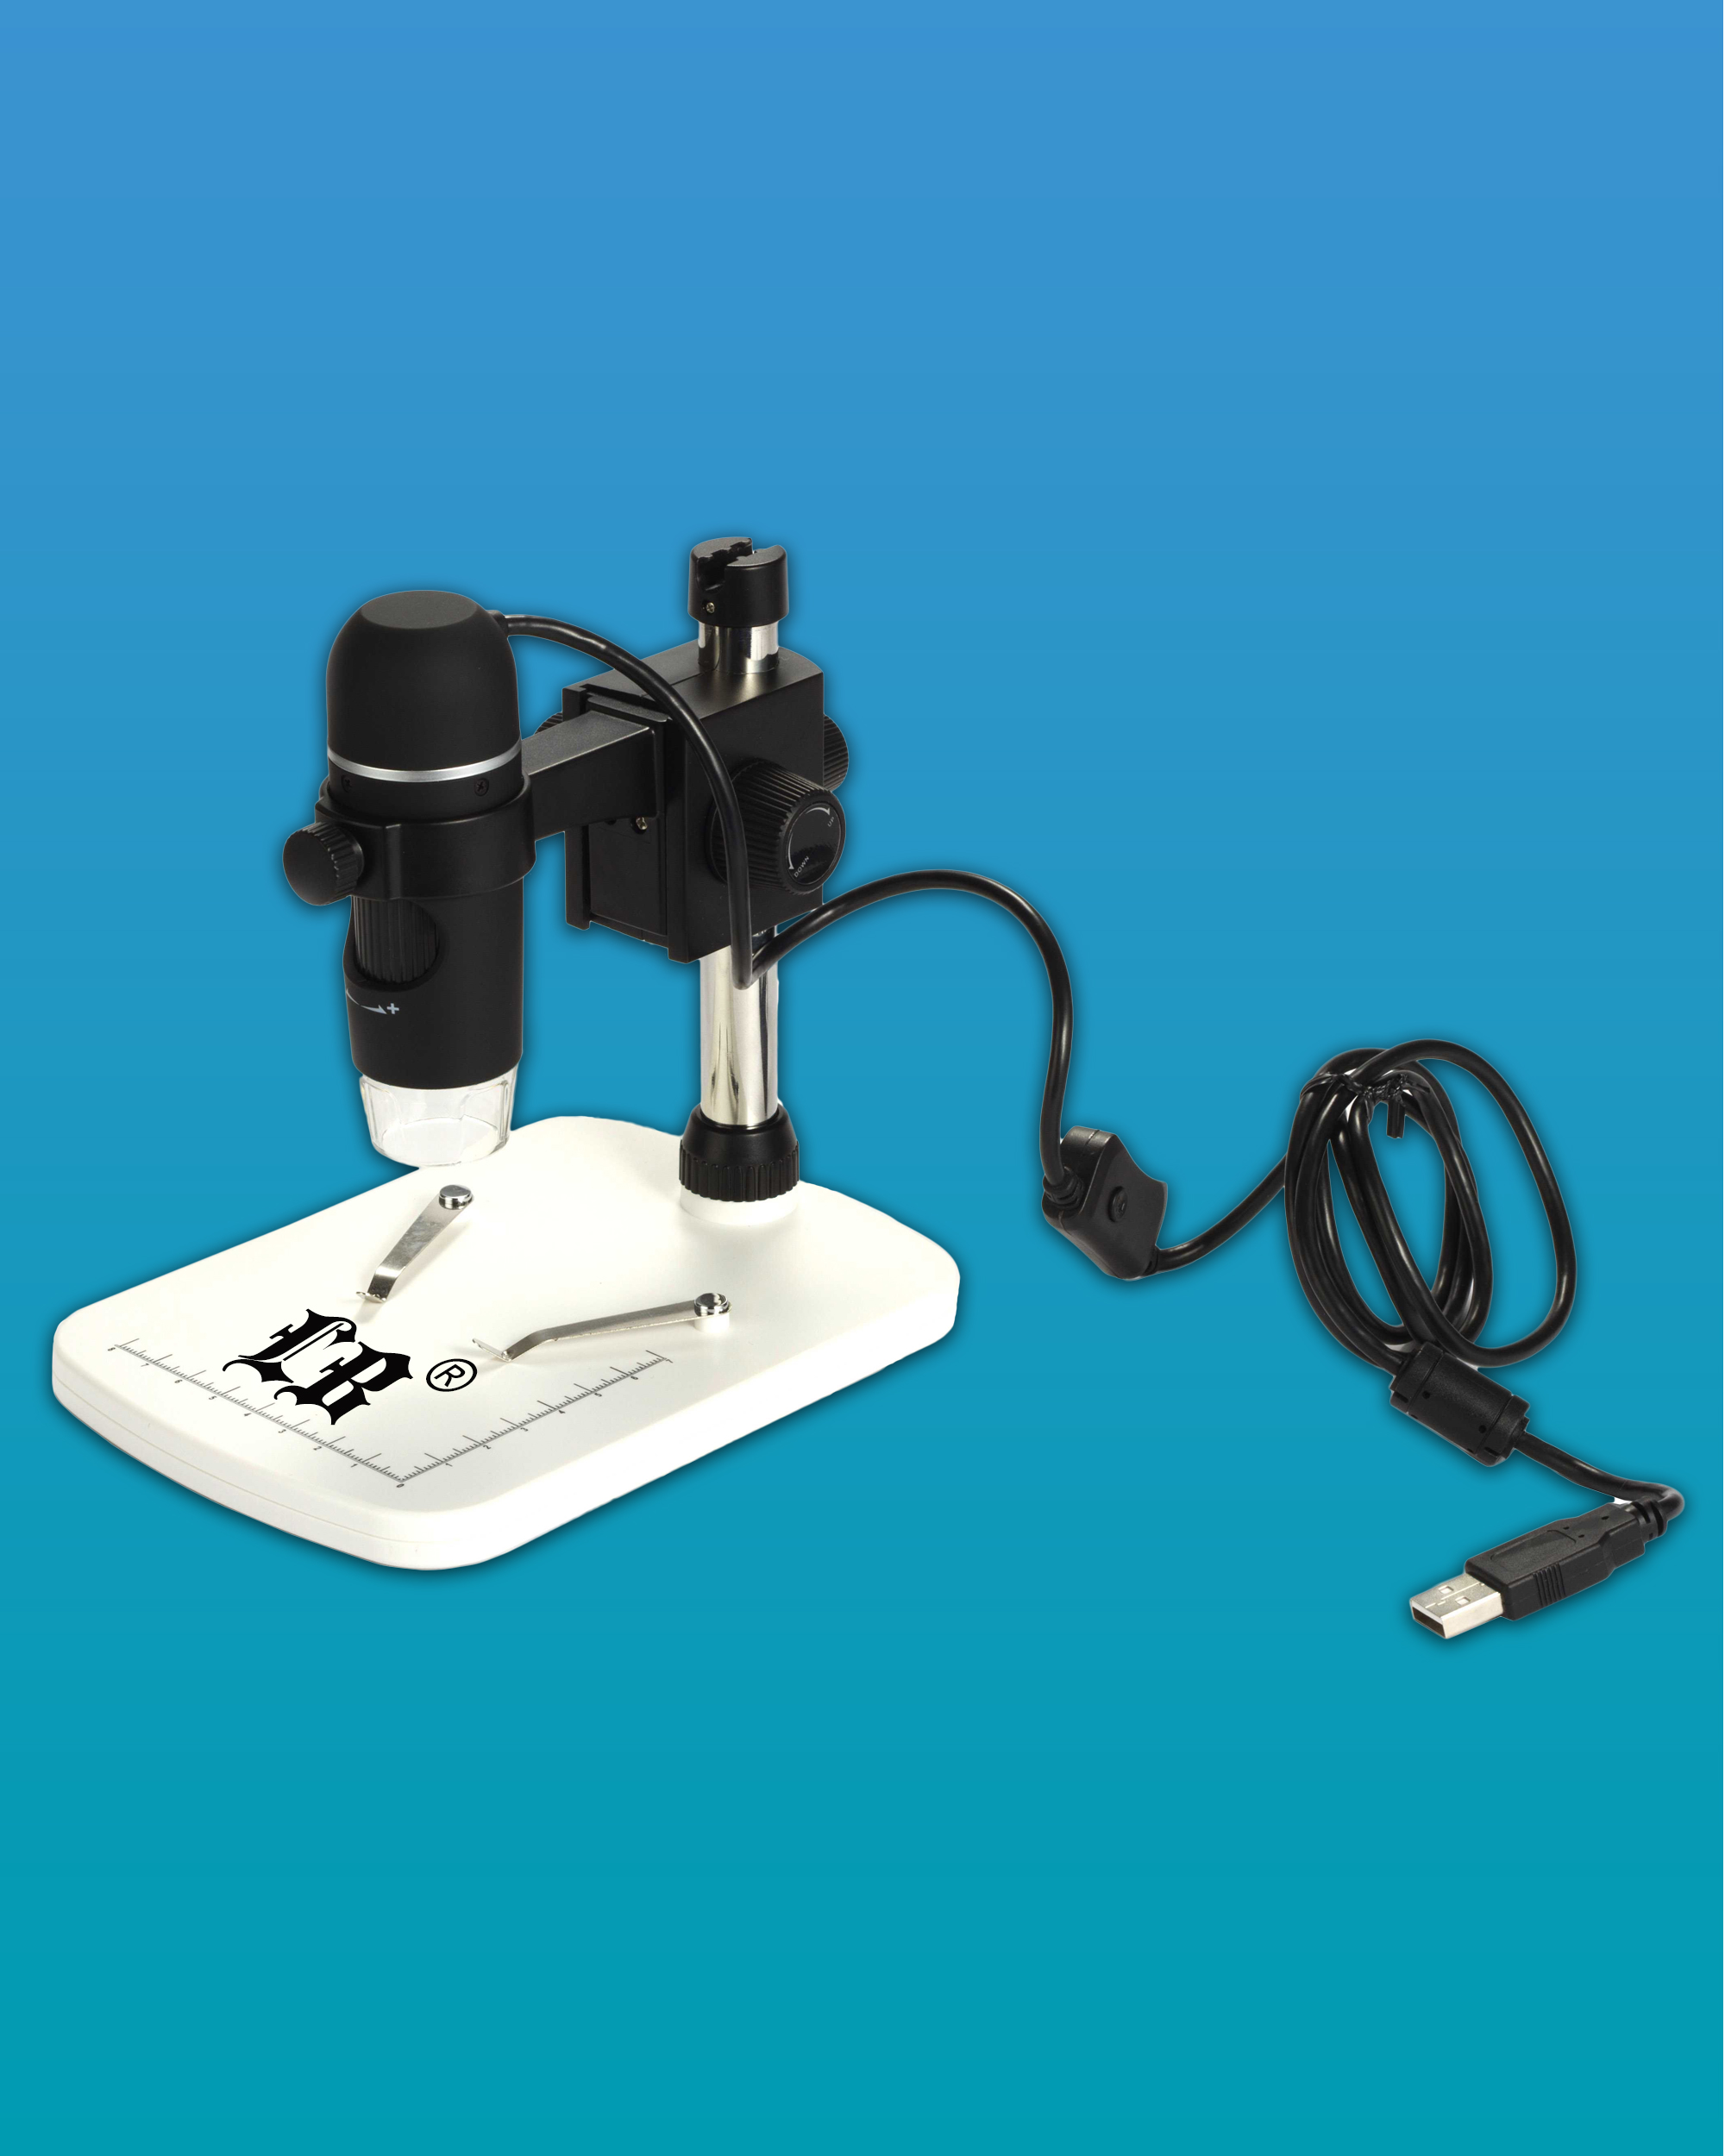 [LB-123] USB Digital Microscope